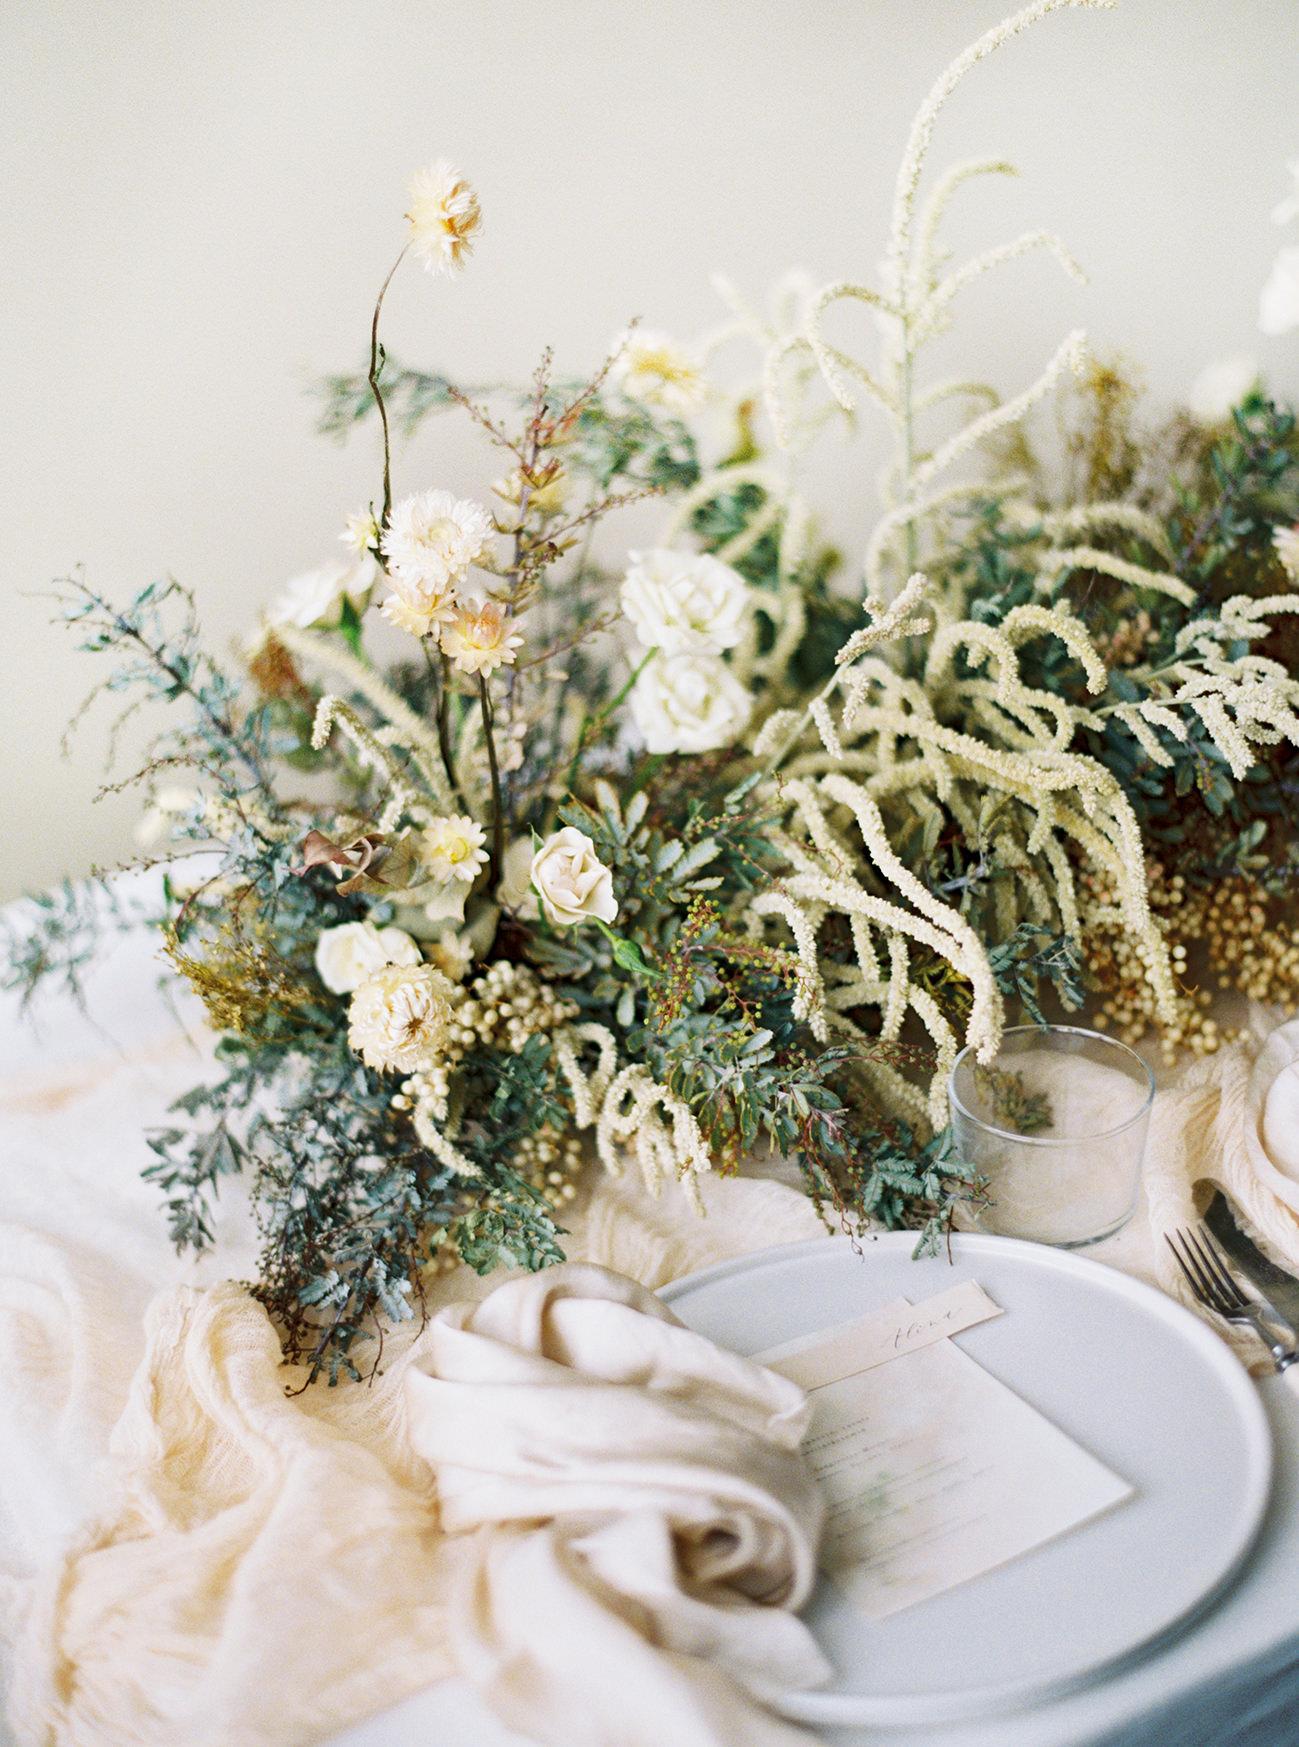 Bridal Inspiration, Wedding Bouquet, Hääkuvaus, Film Wedding Photographer, Table Setting Inspiration, Stationery, Dried Flowers, www.nordandmae.com, www.susannanordvall (19).jpg